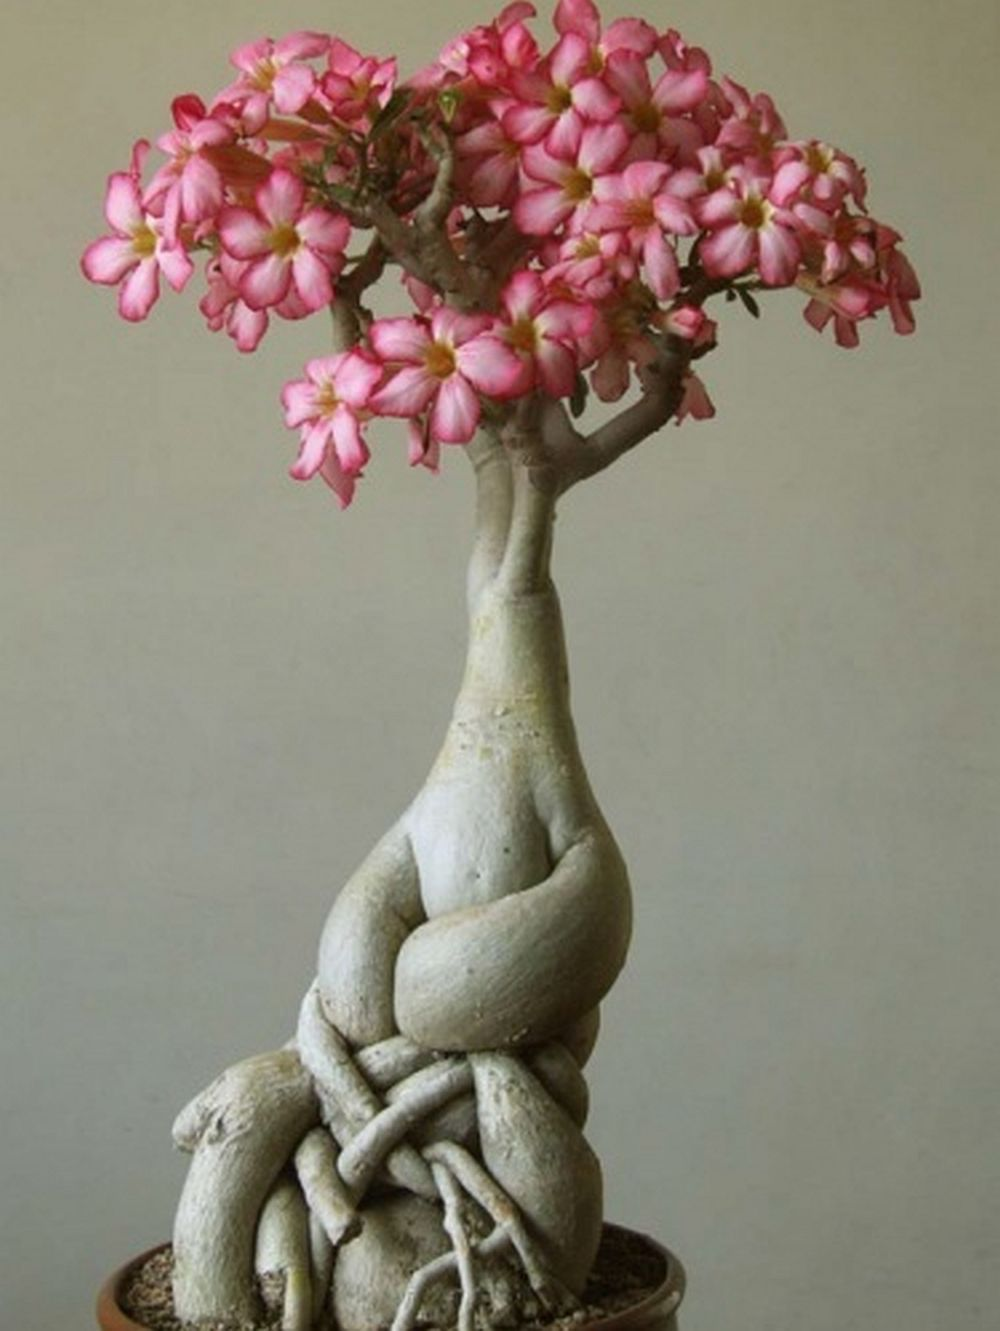 adelaparvu.com despre Adenium Obesum, Trandafirul desertului, Text Carli Marian  (5)